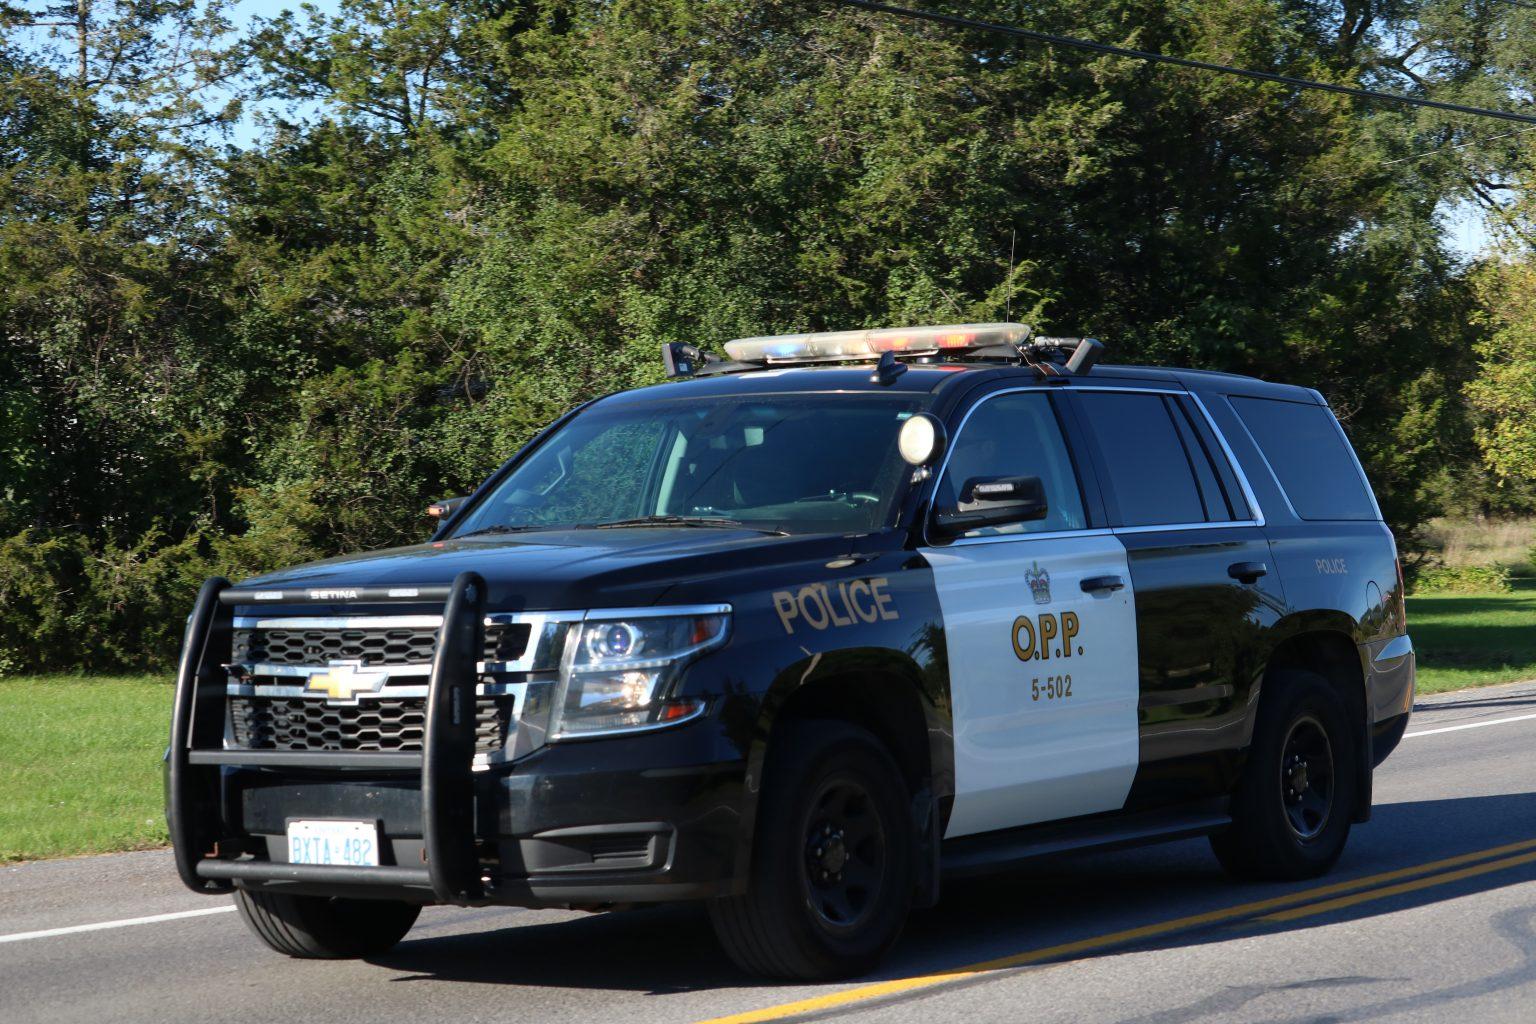 OPP kicks off Road Safety Week with startling statistics ...